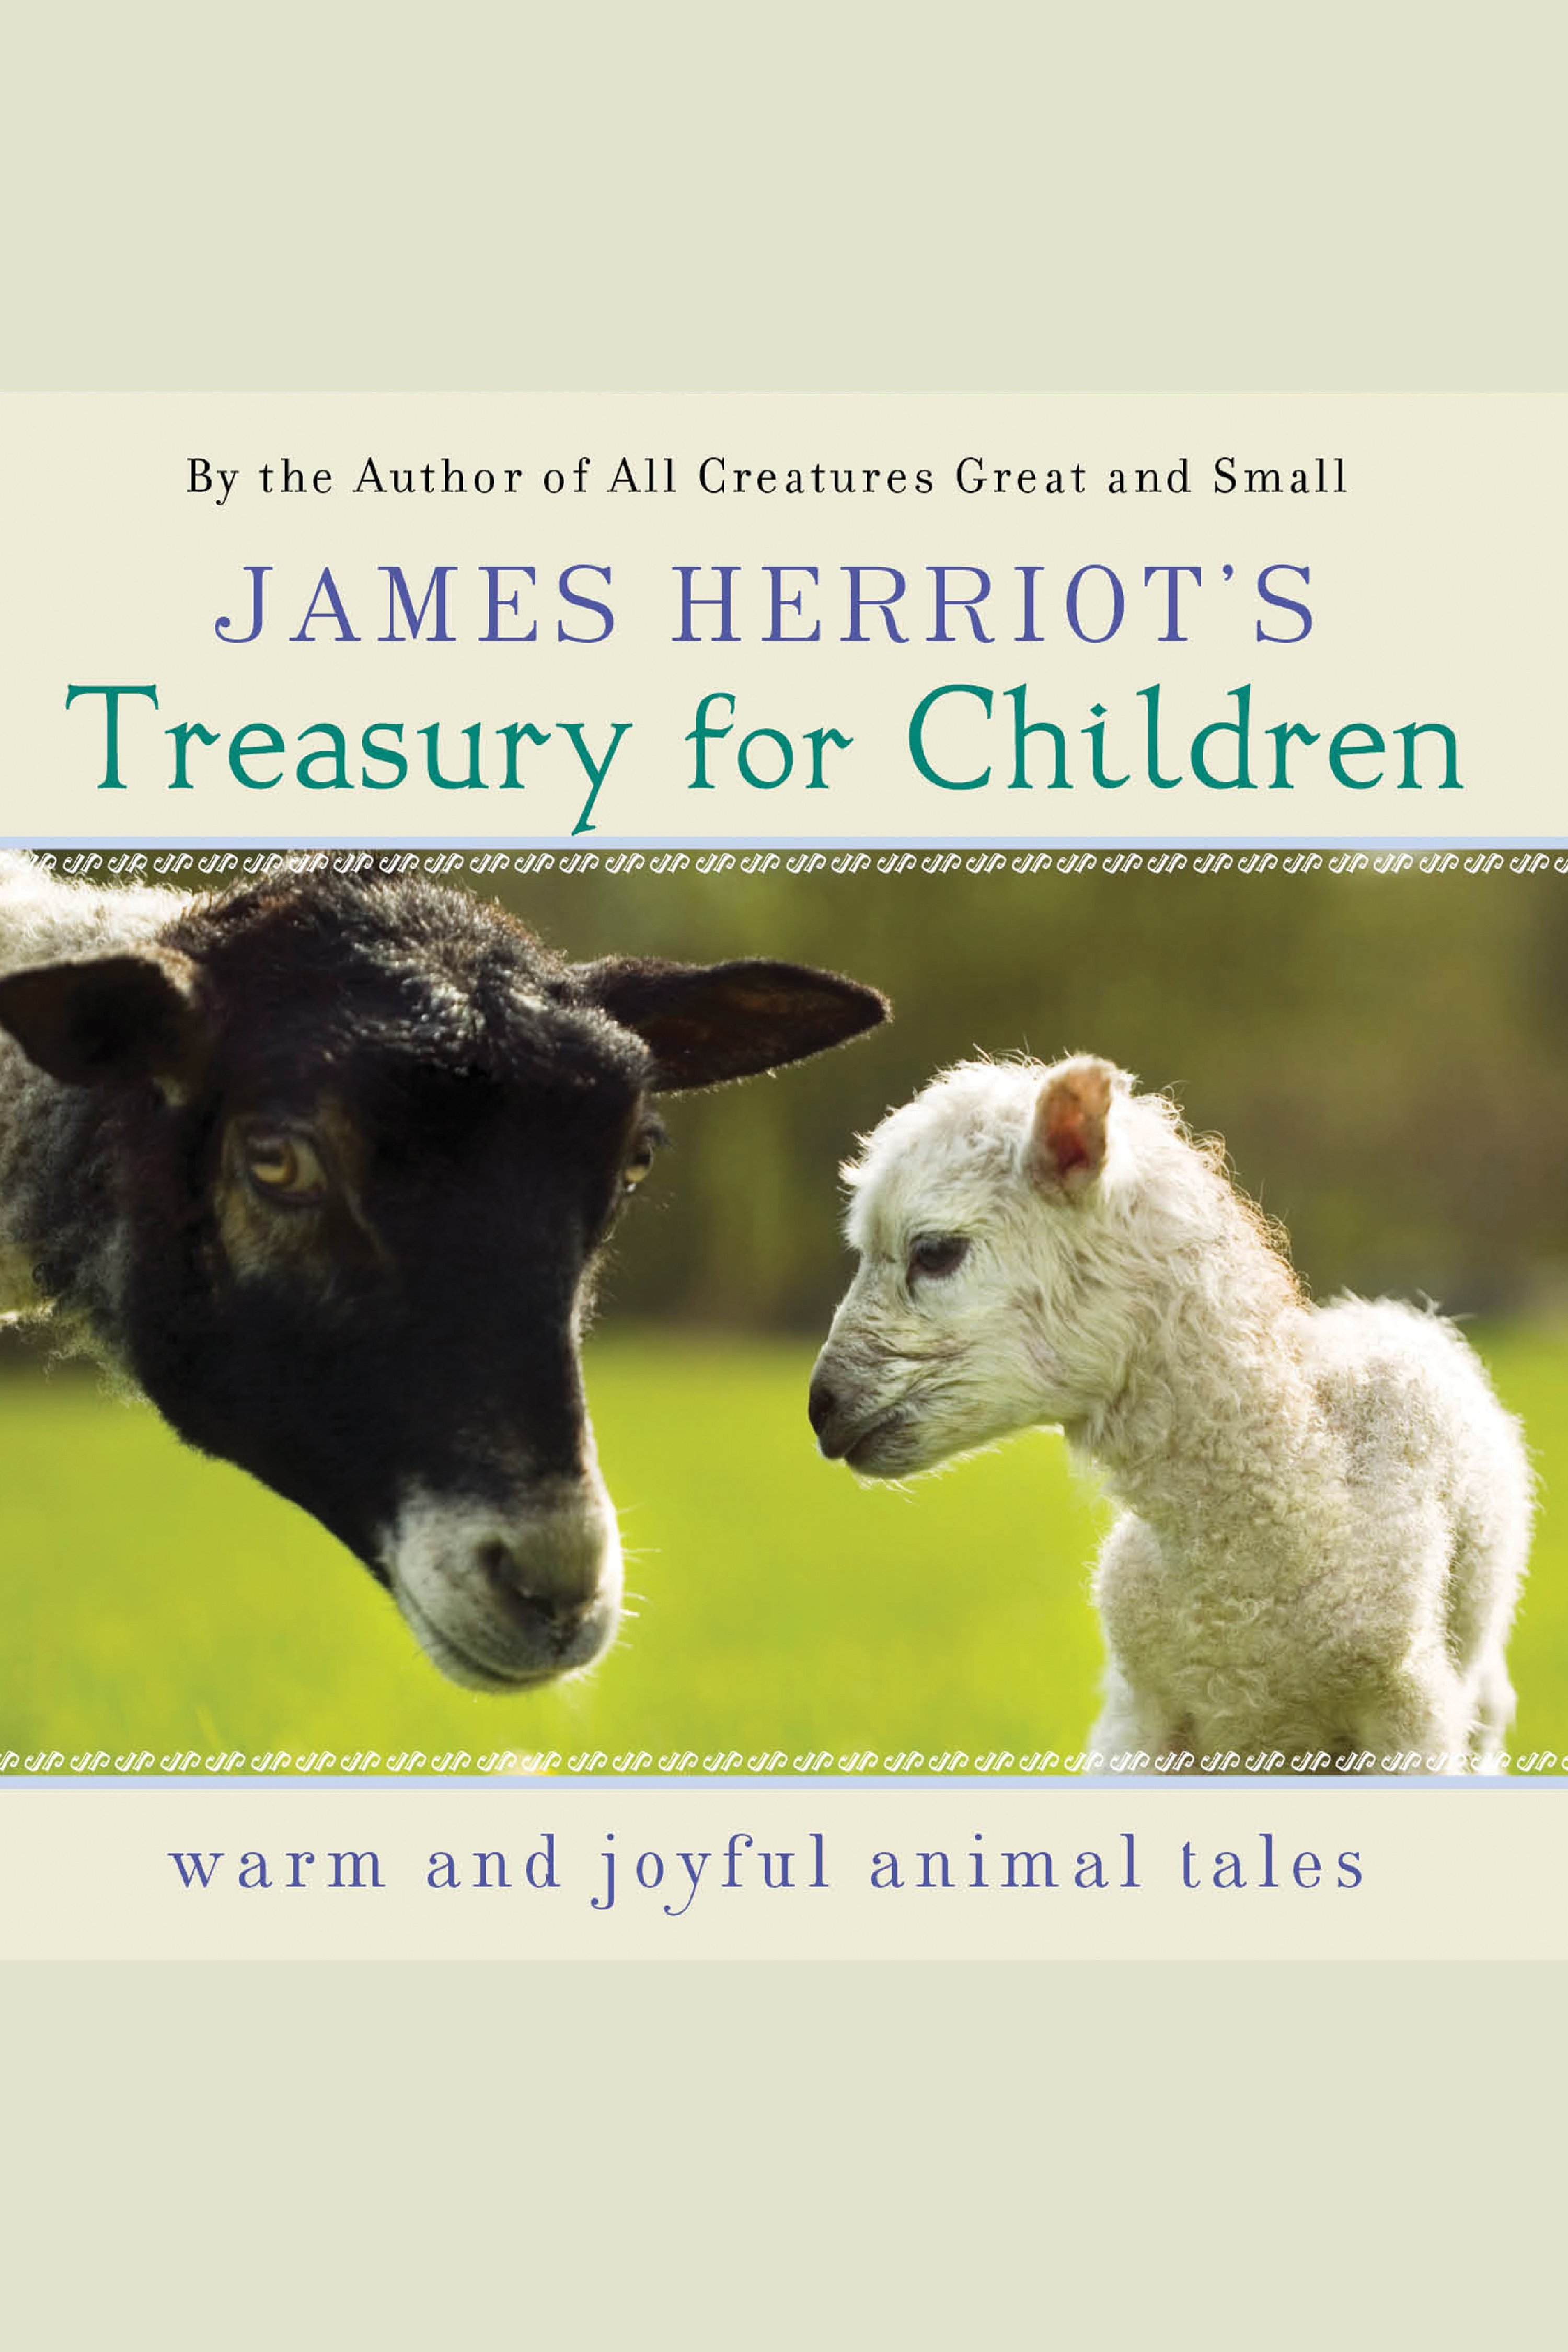 James Herriot's treasury for children cover image